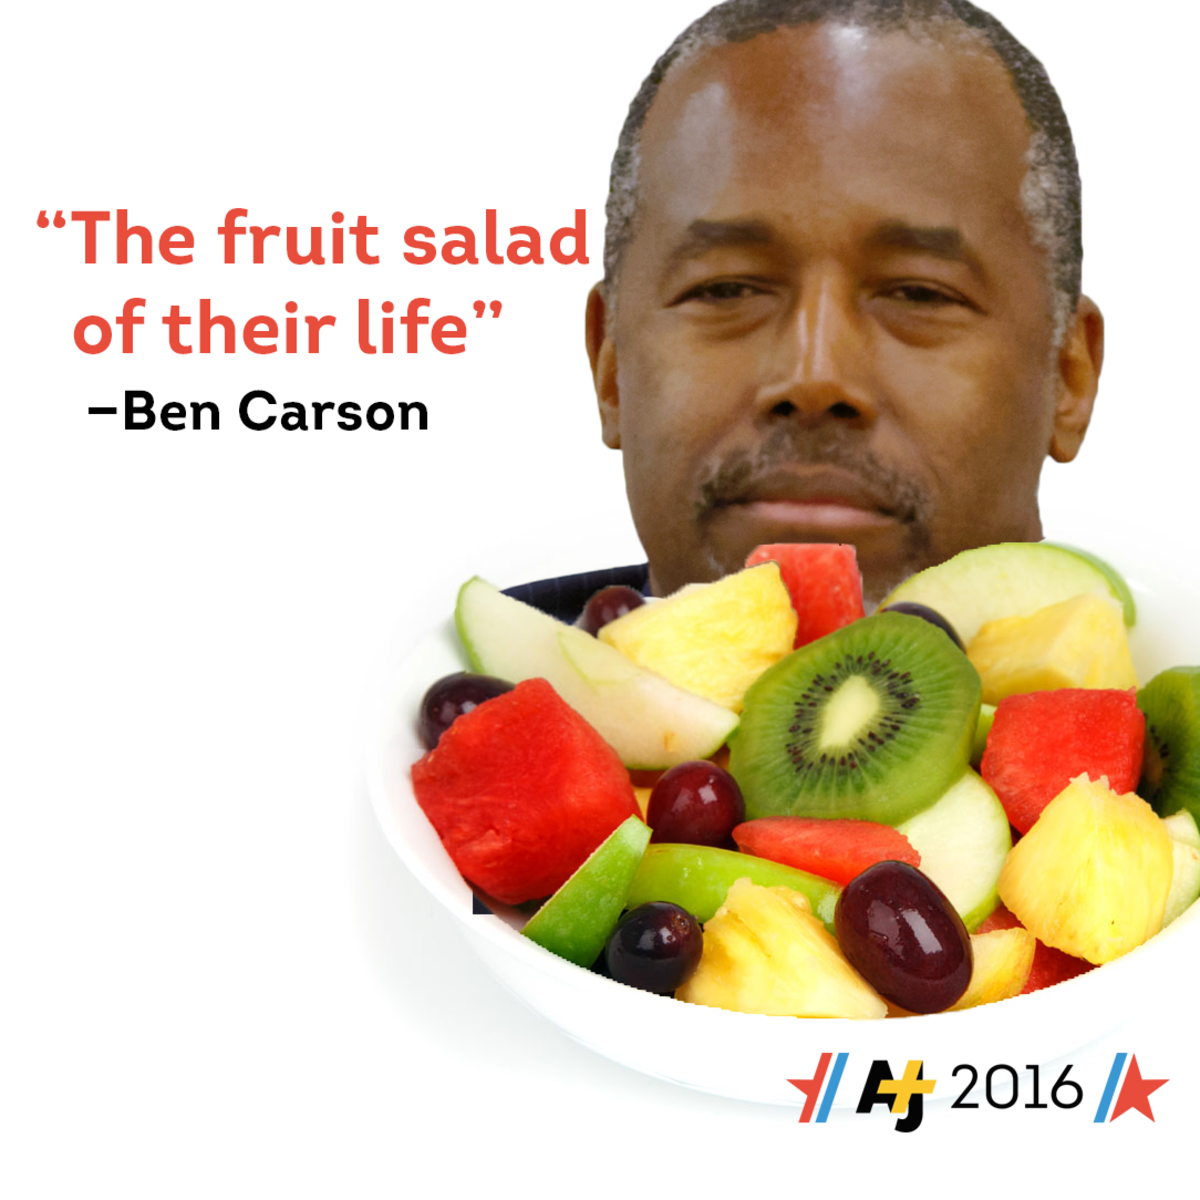 Ben Carson Fruit Salad AJ+